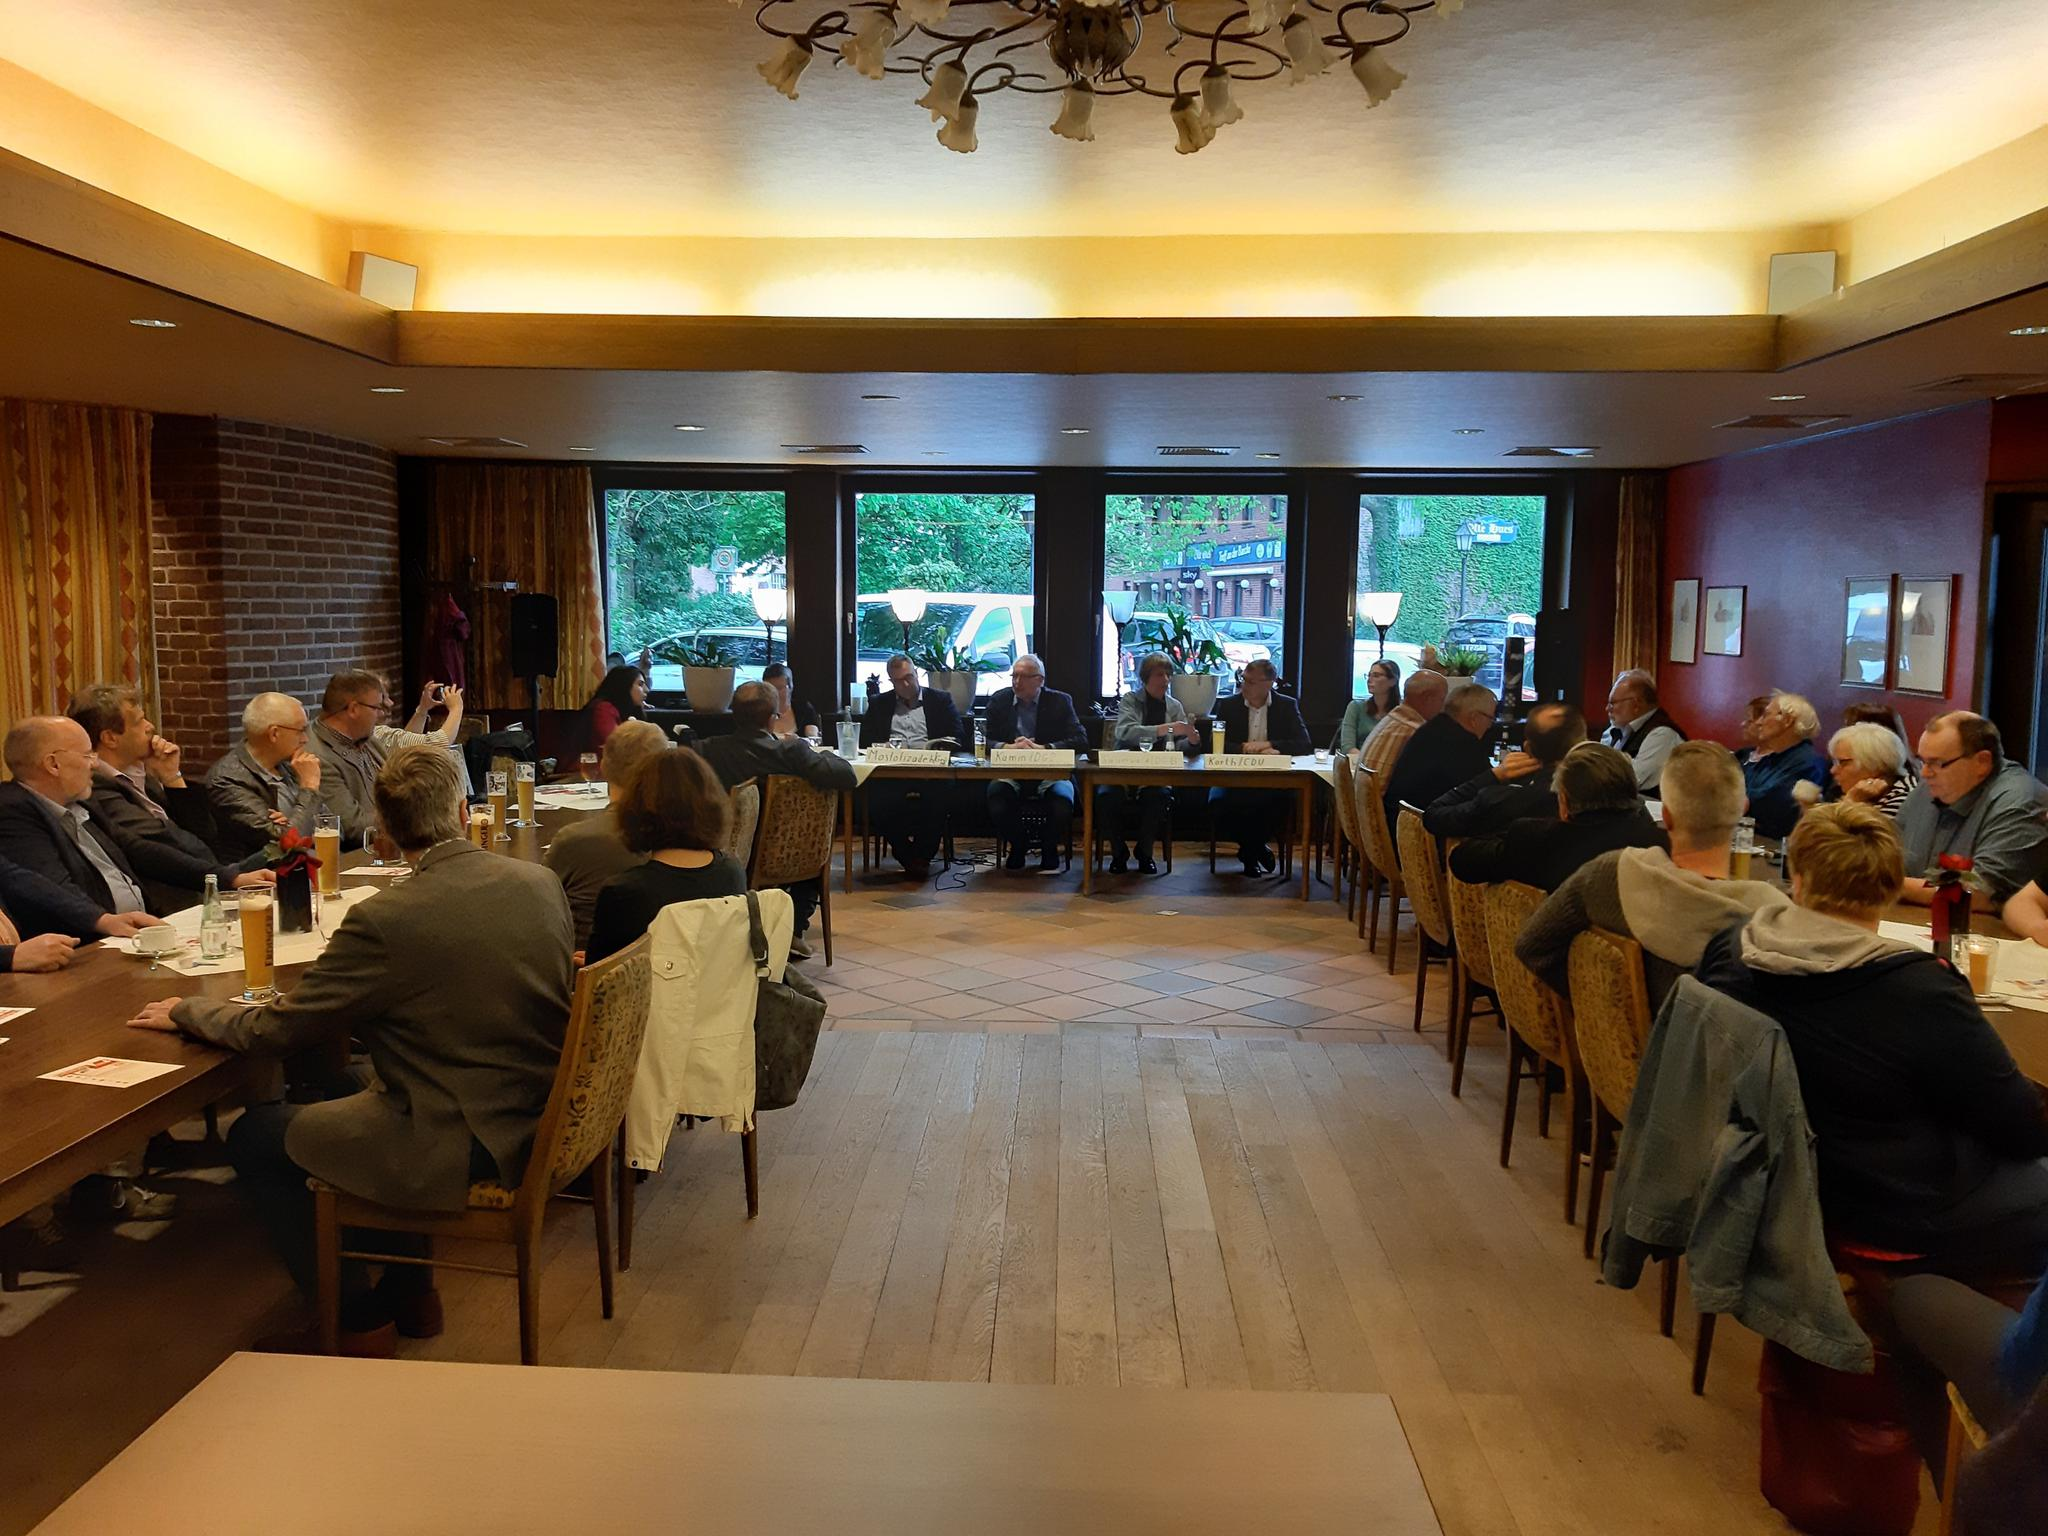 Podiumsdiskussion in Südlohn-Oerding